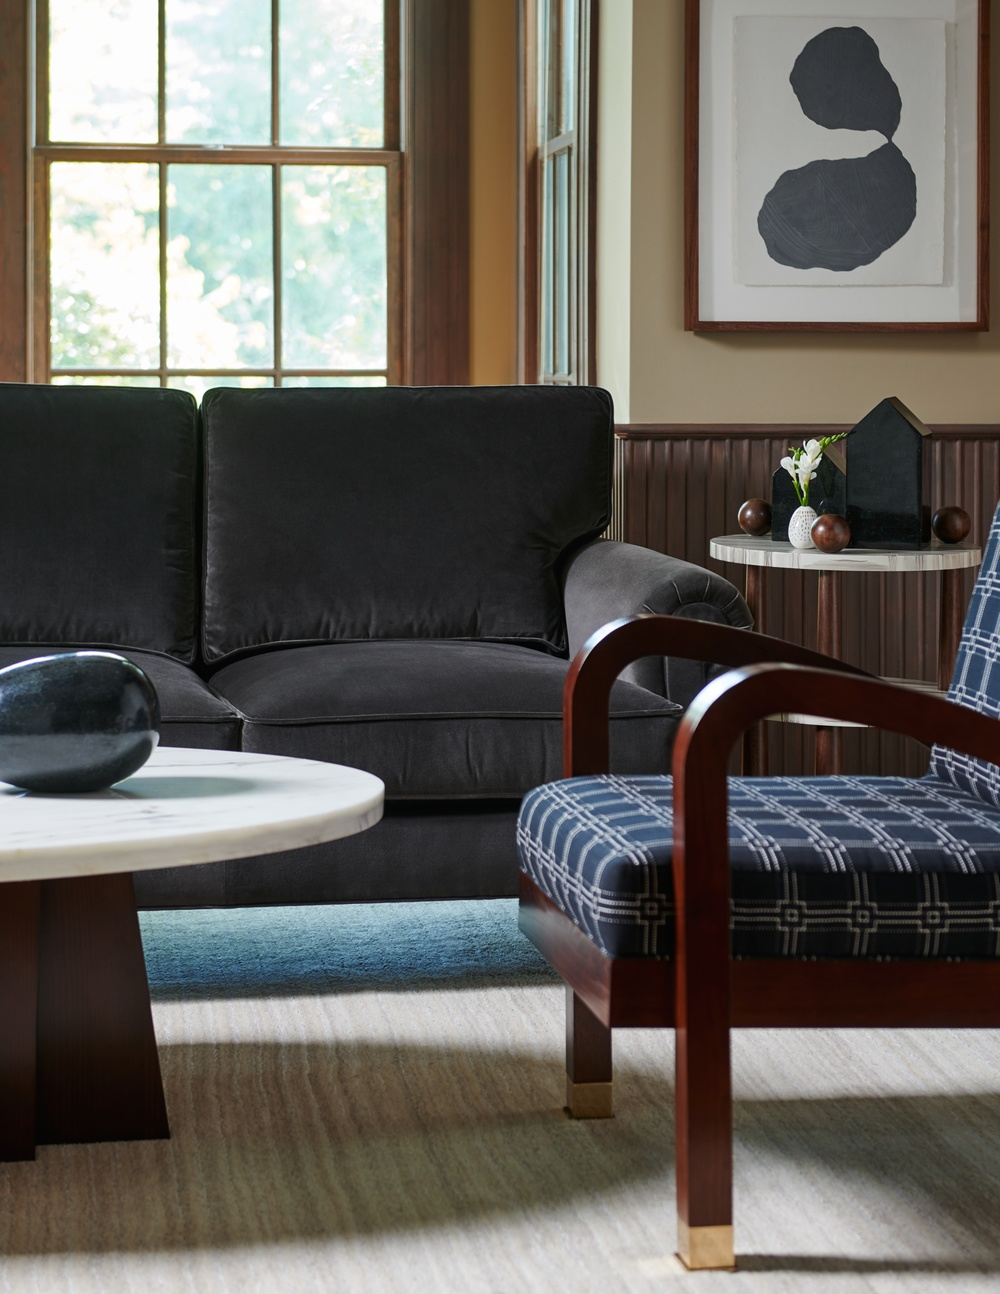 Hickory Chair - Ridley Sofa